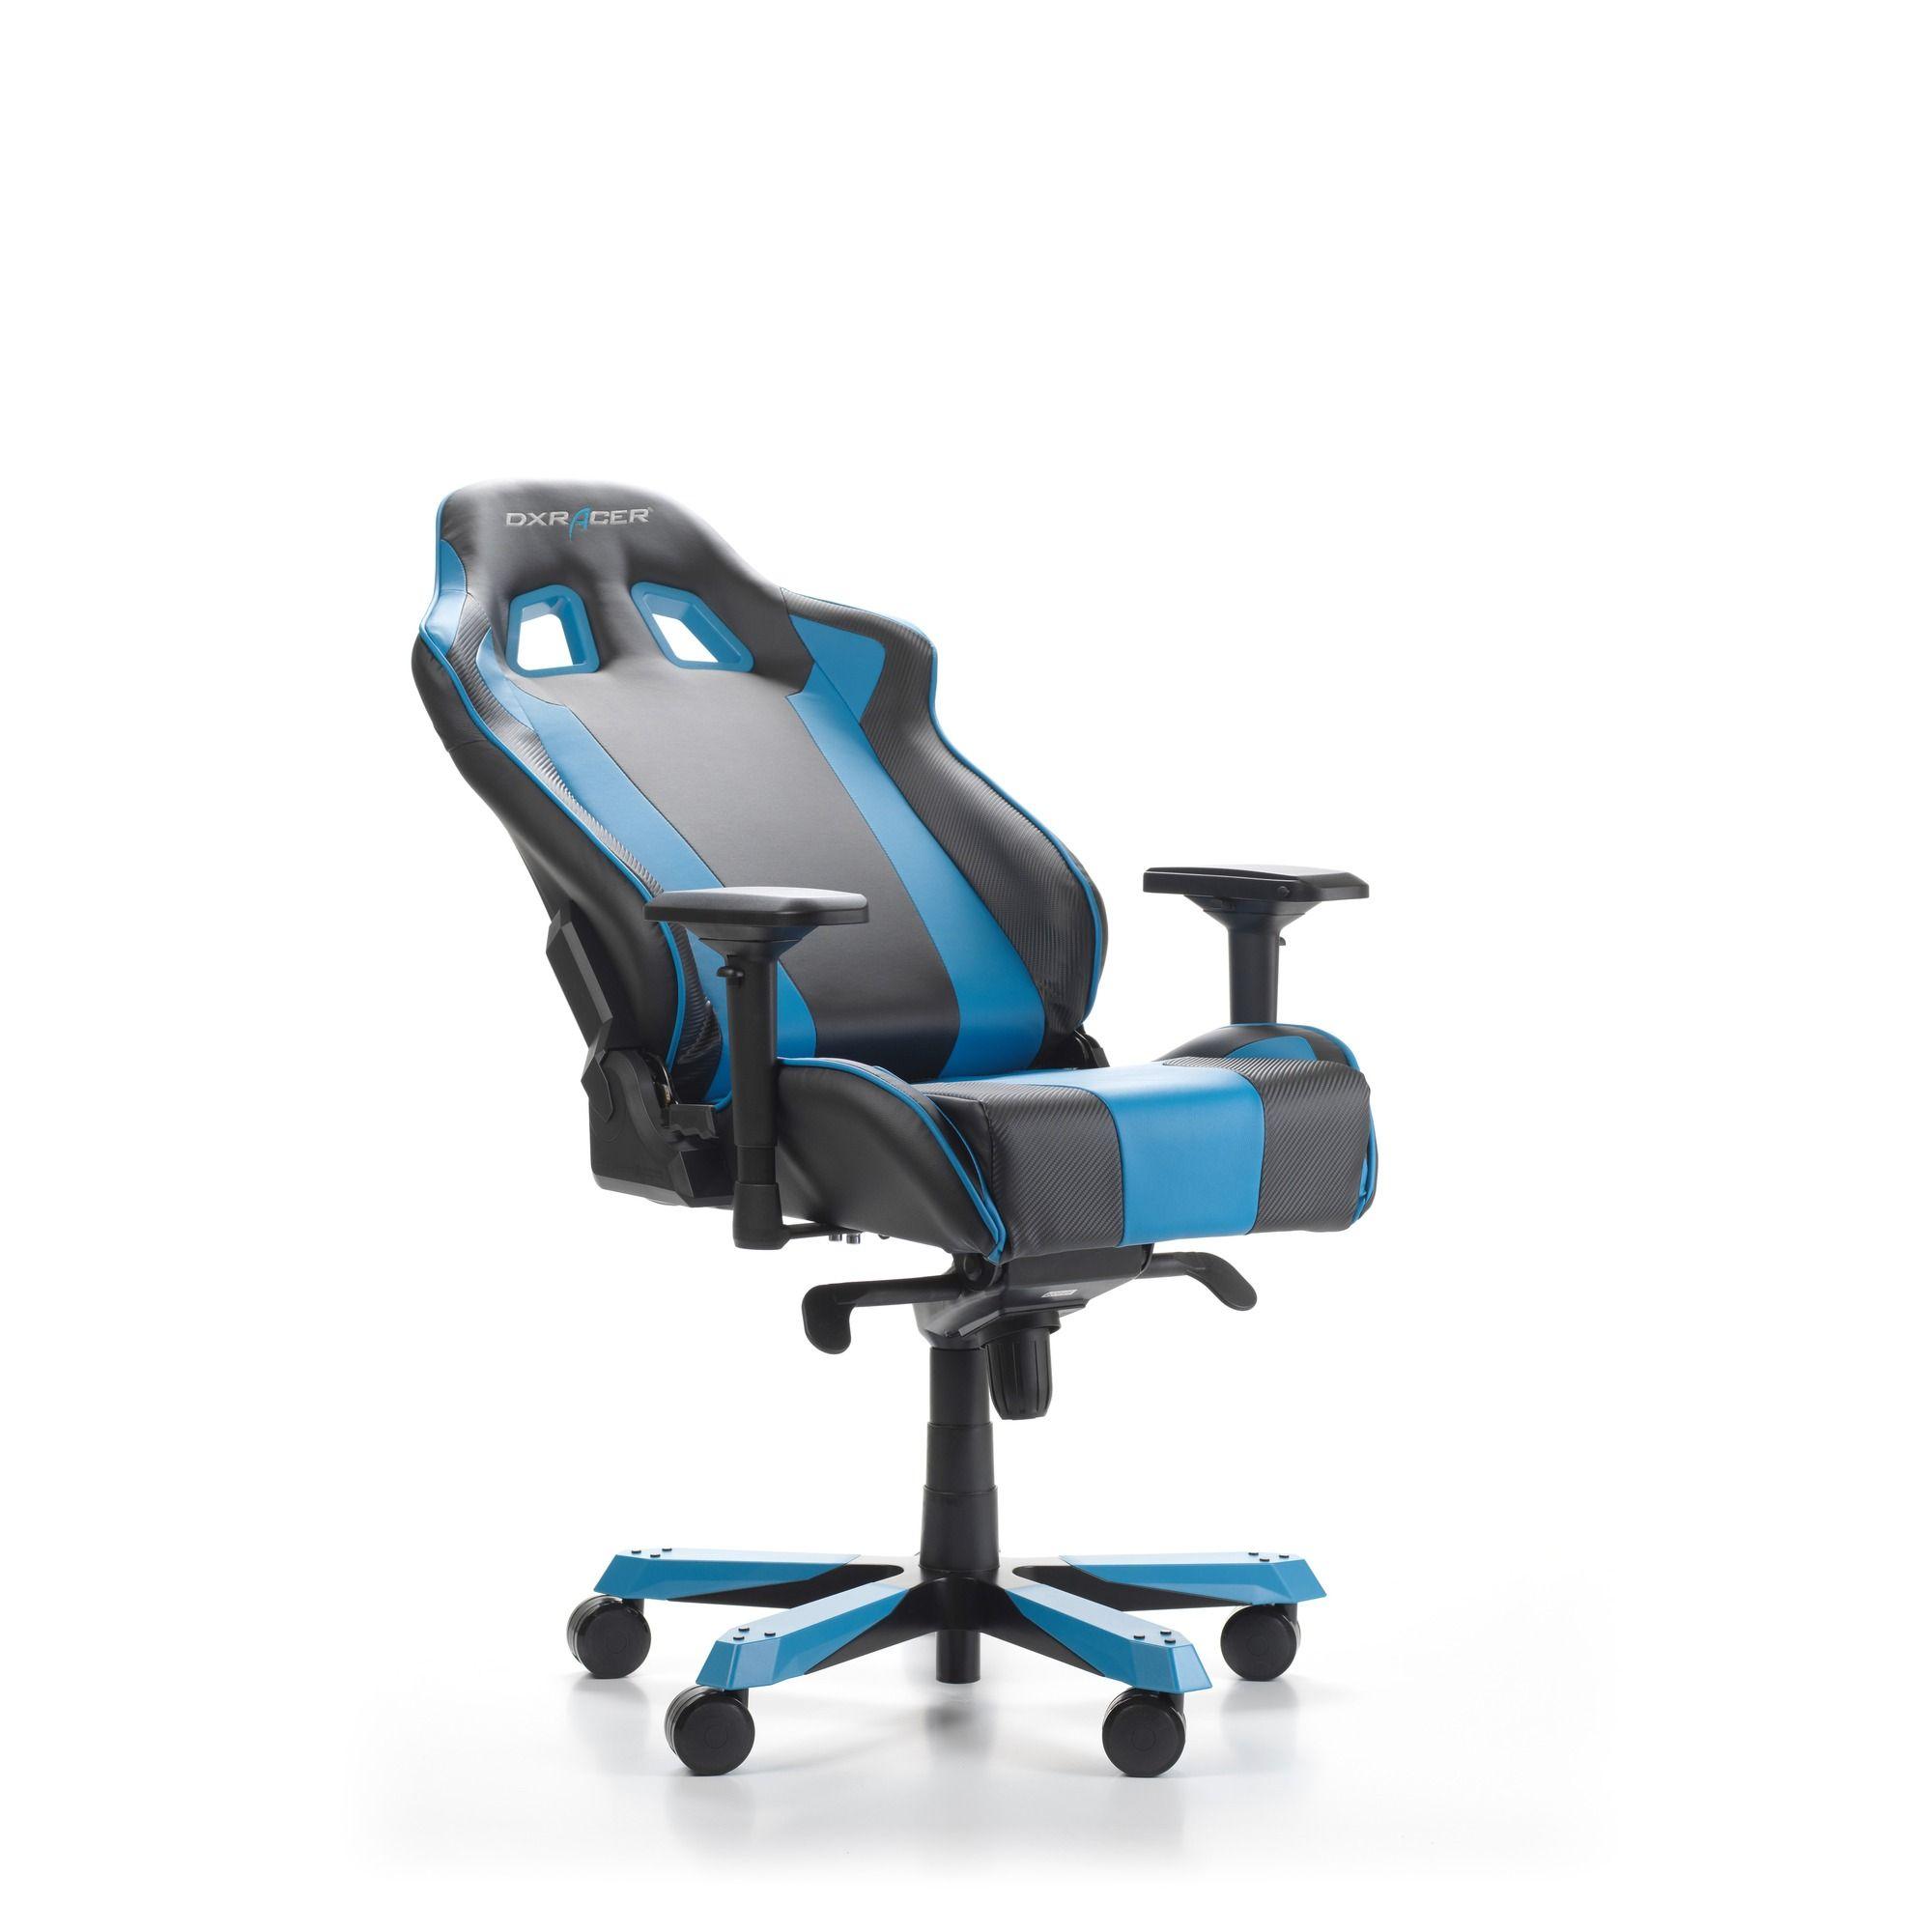 Геймърски стол DXRacer - серия KING, черен/син - OH/KS06/NB - 5